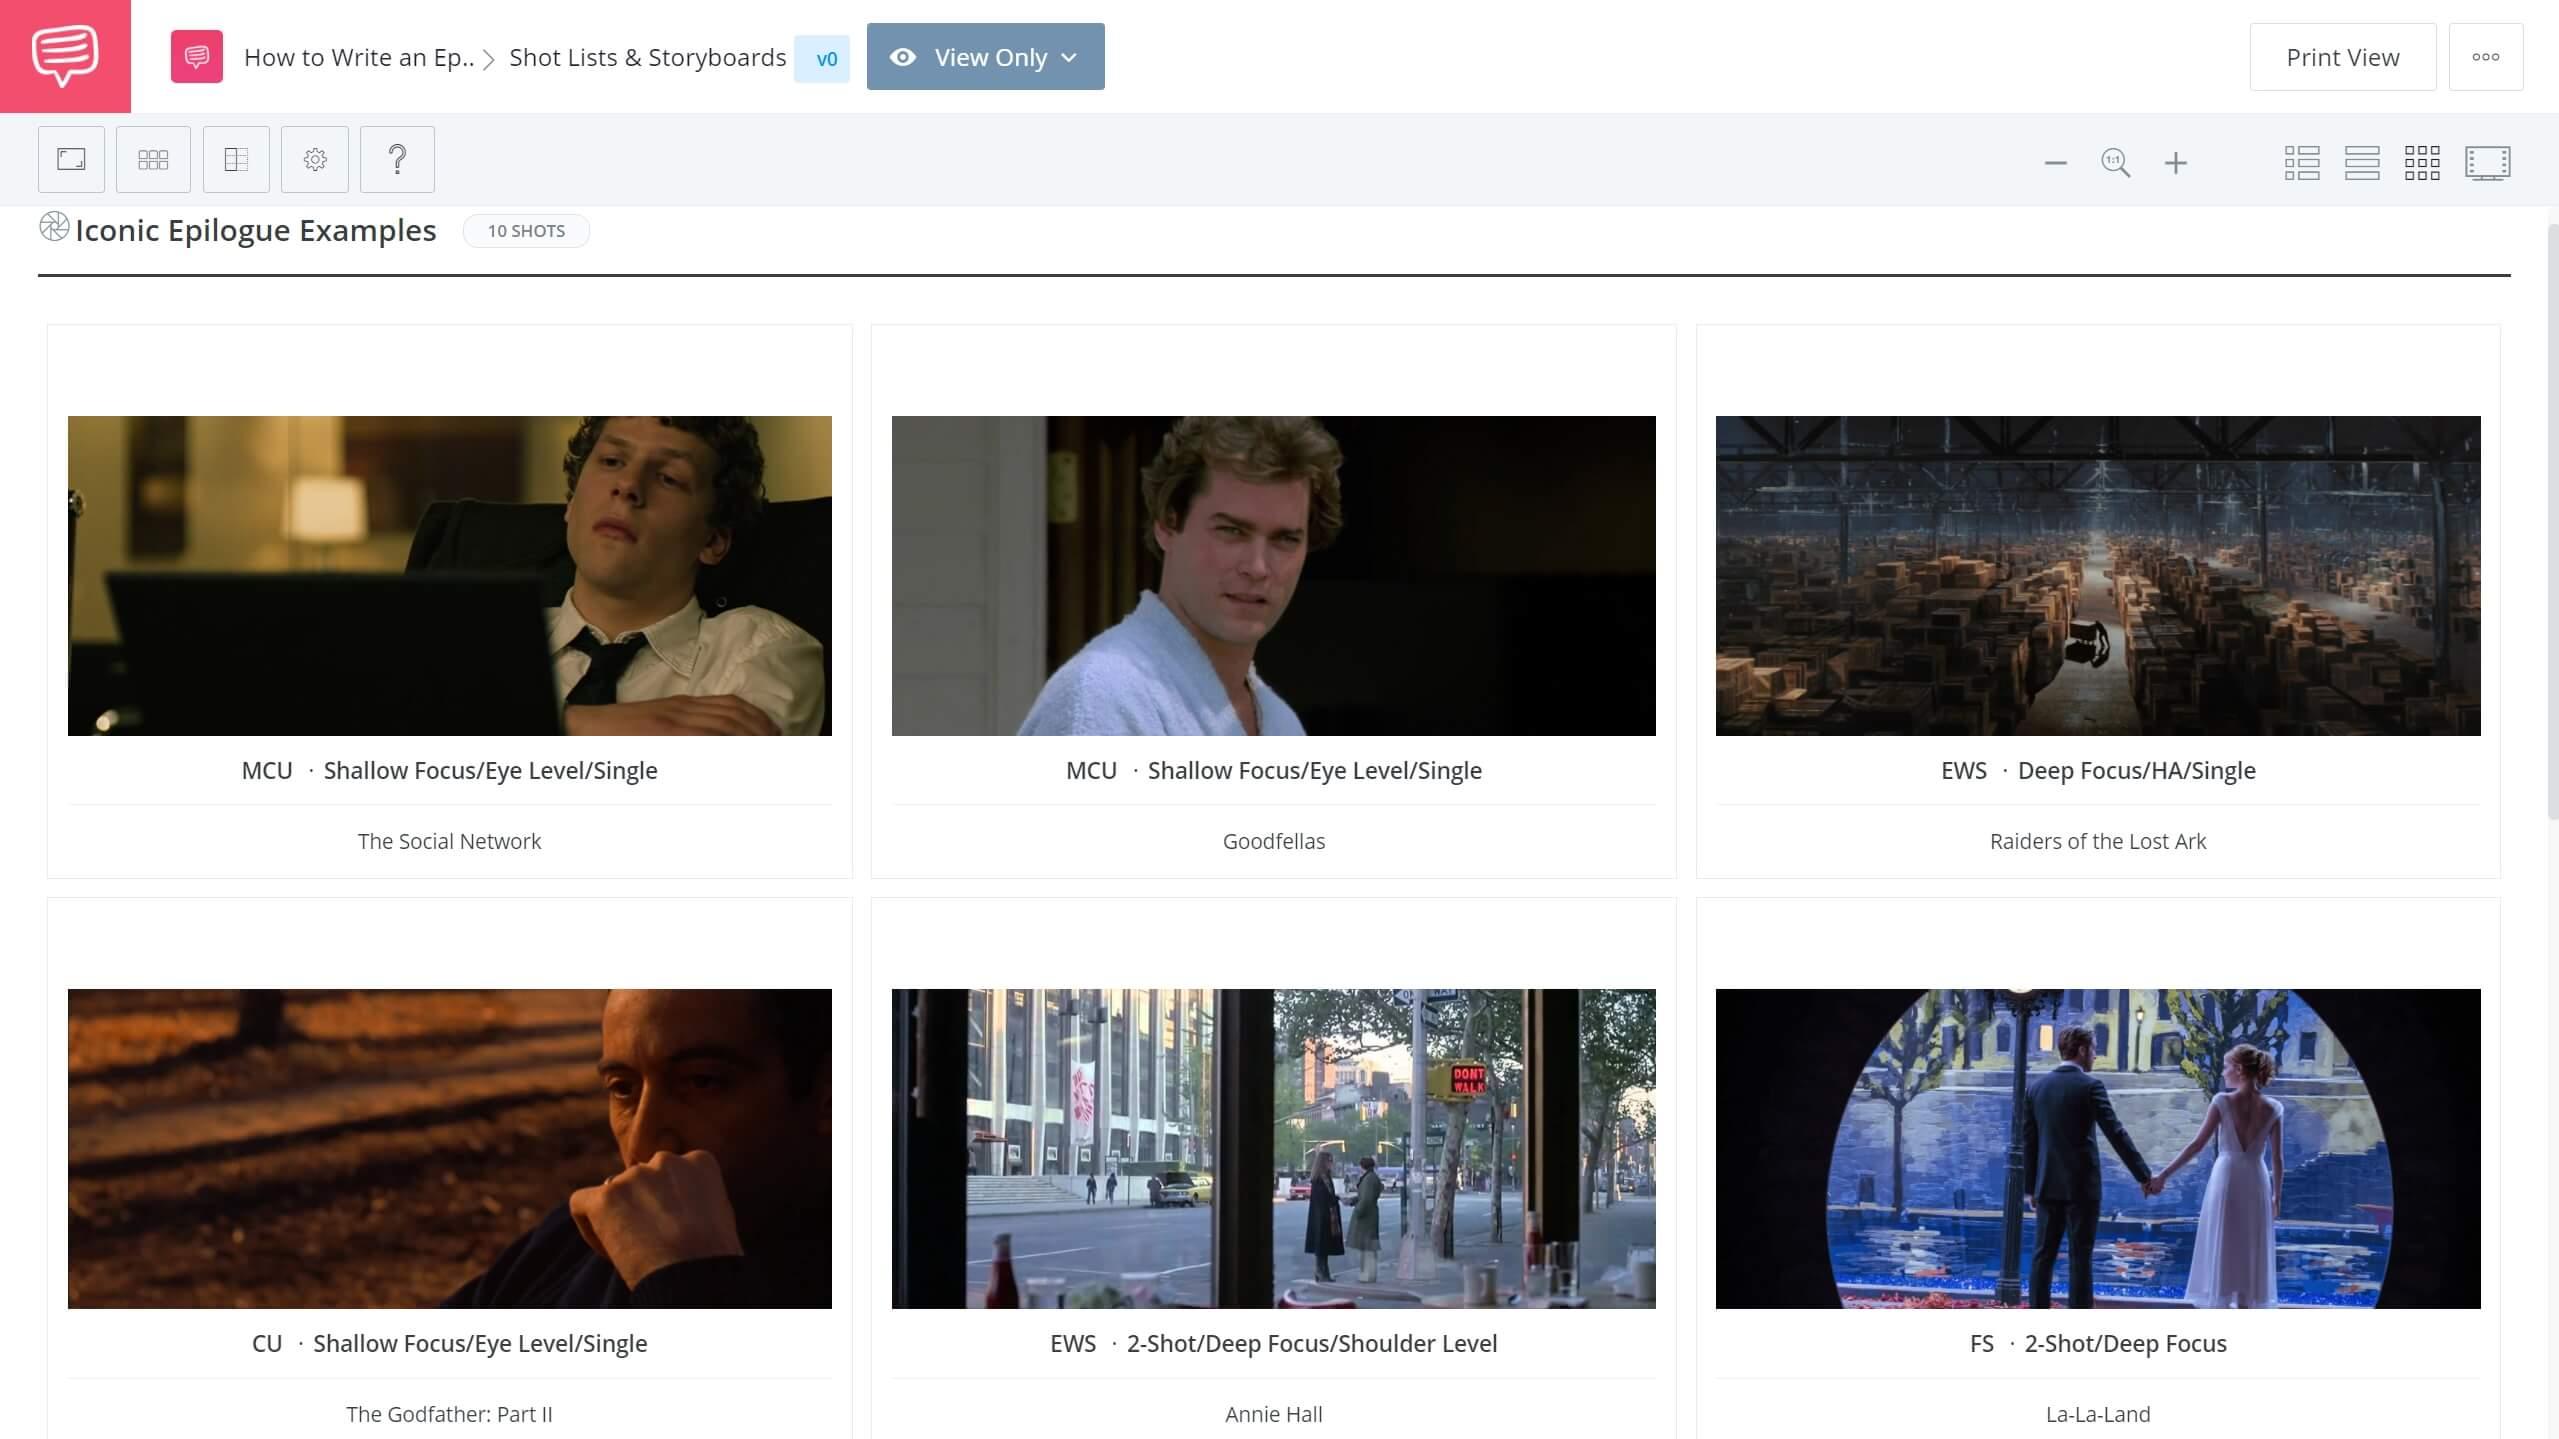 How to Write an Epilogue Iconic Epilogue Example StudioBinder Shot Listing Software